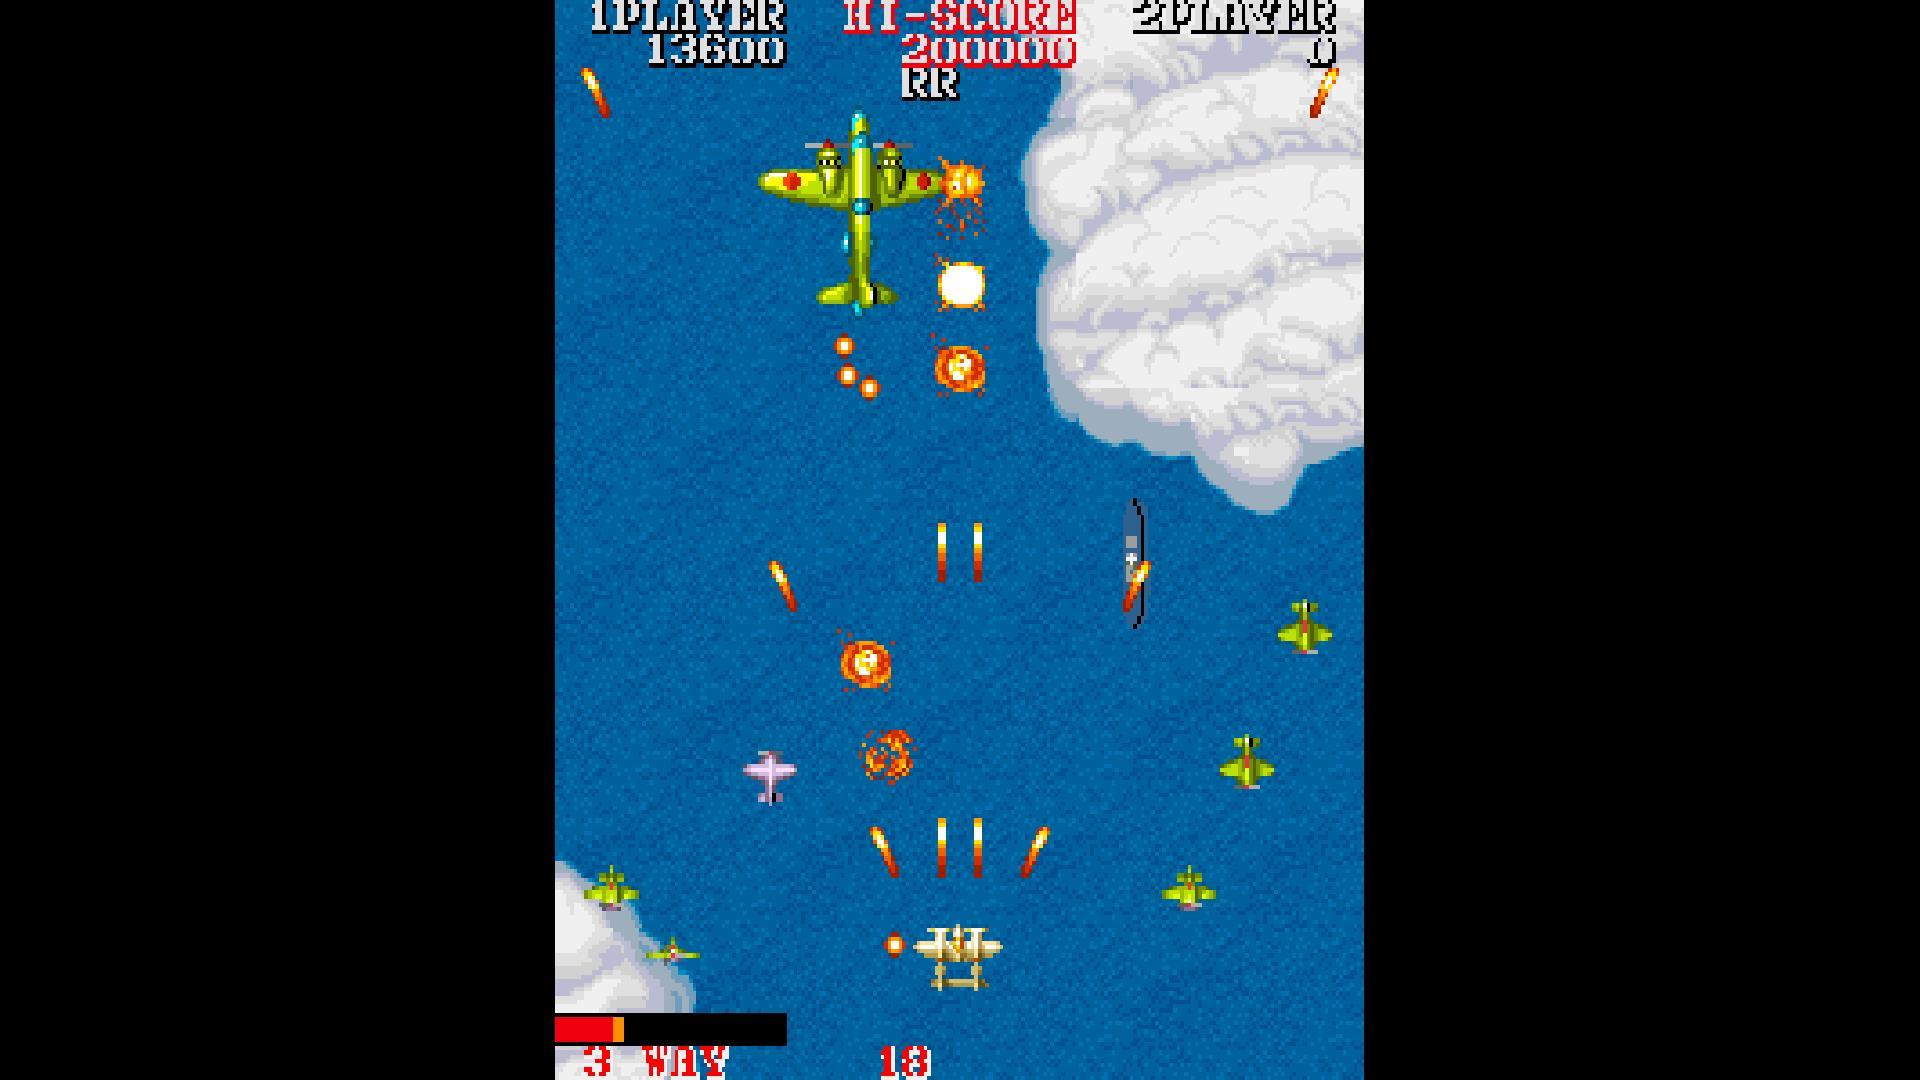 「Capcom Arcade Stadium(無料)・1943 - ミッドウェイ海戦 -」